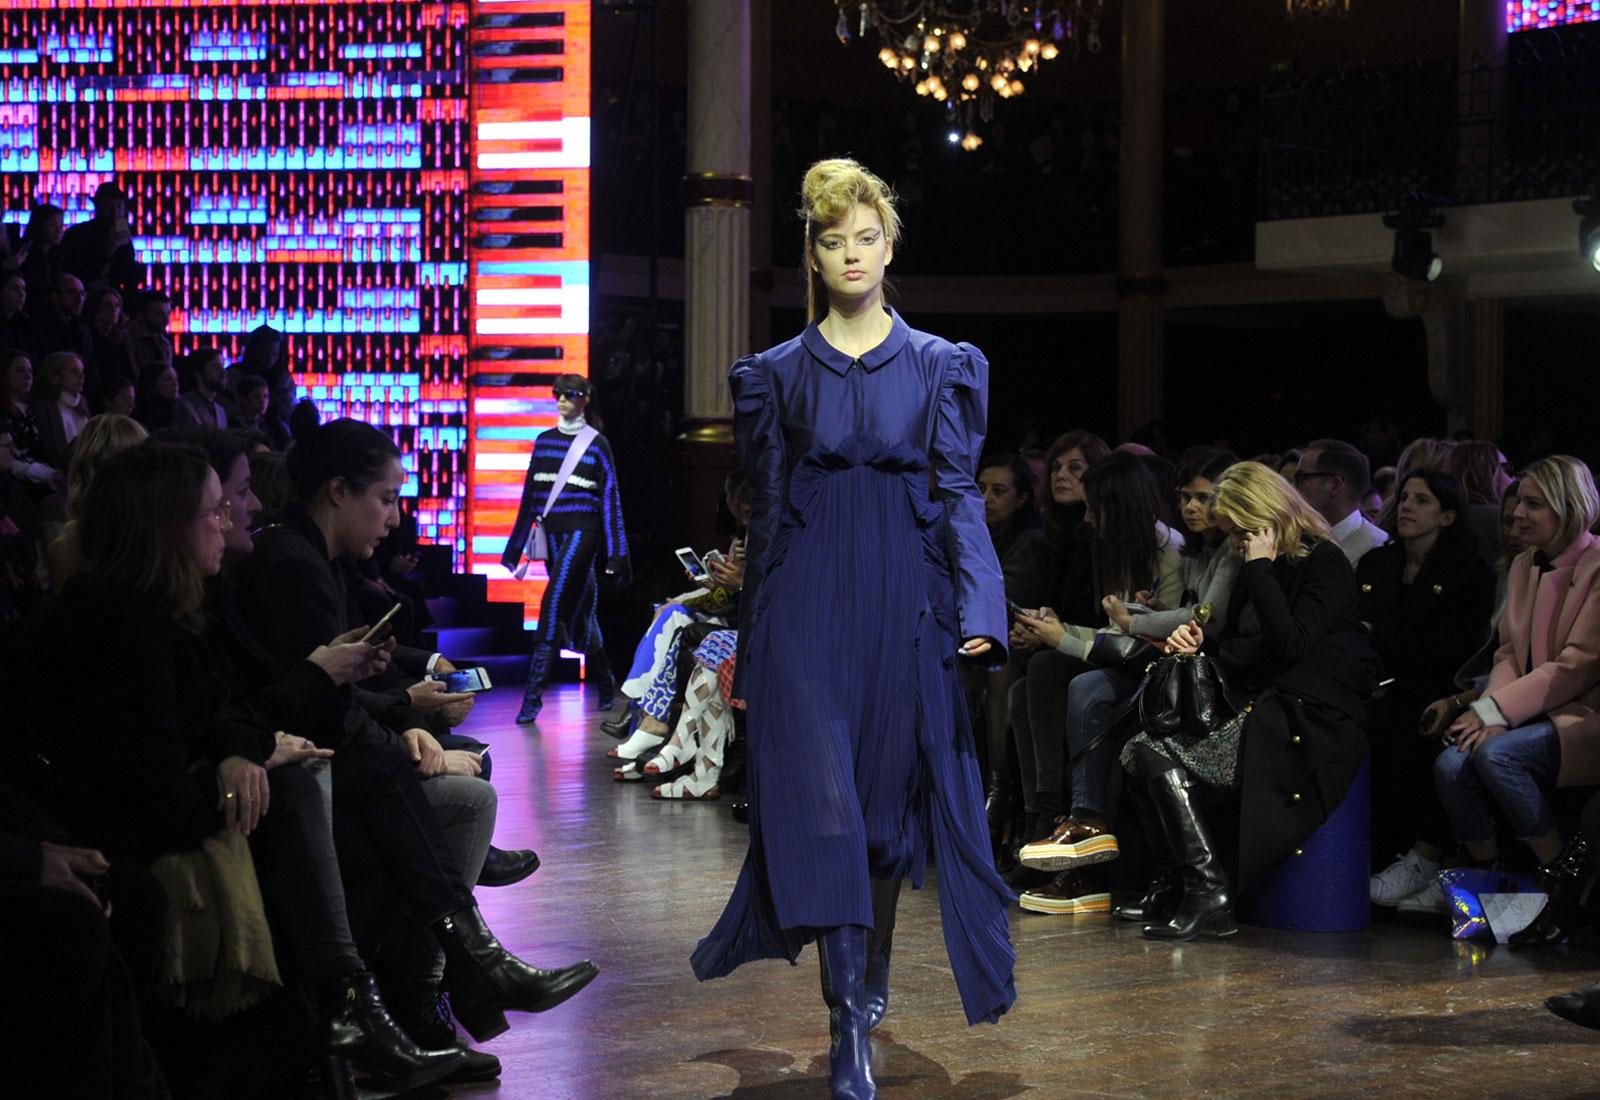 kenzo purple ruffle dress aw16/17 fashion trends 1600 x 1100